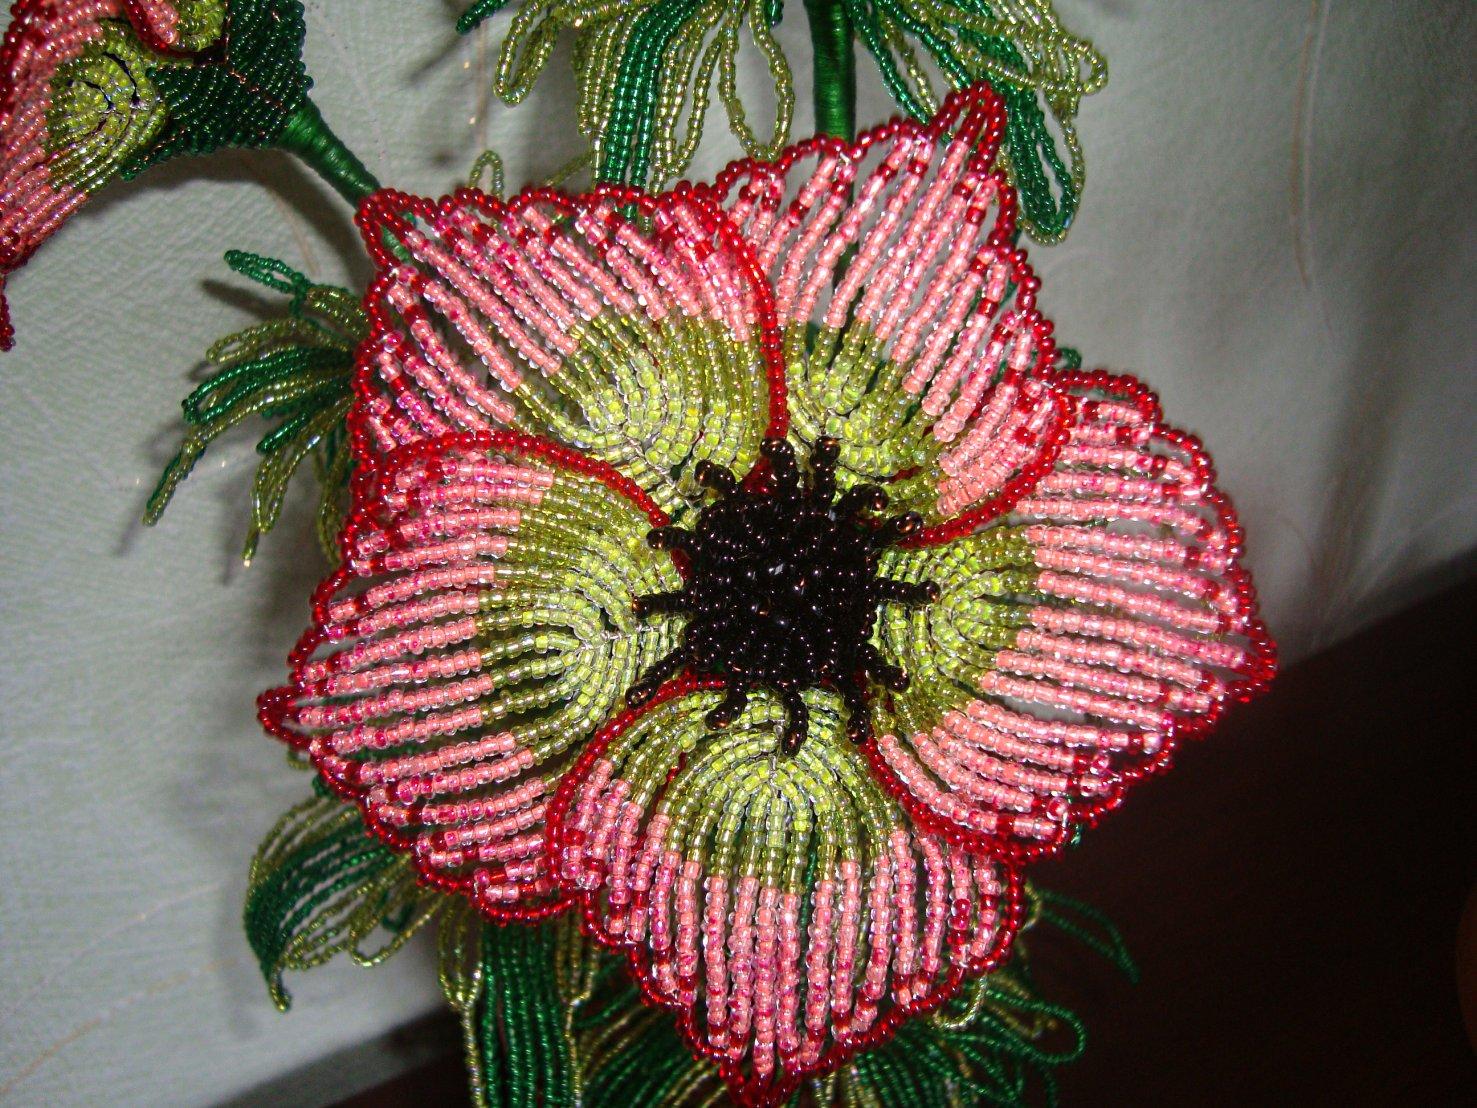 плетение цветов из бисера фото. плетение цветов из бисера фото 4.